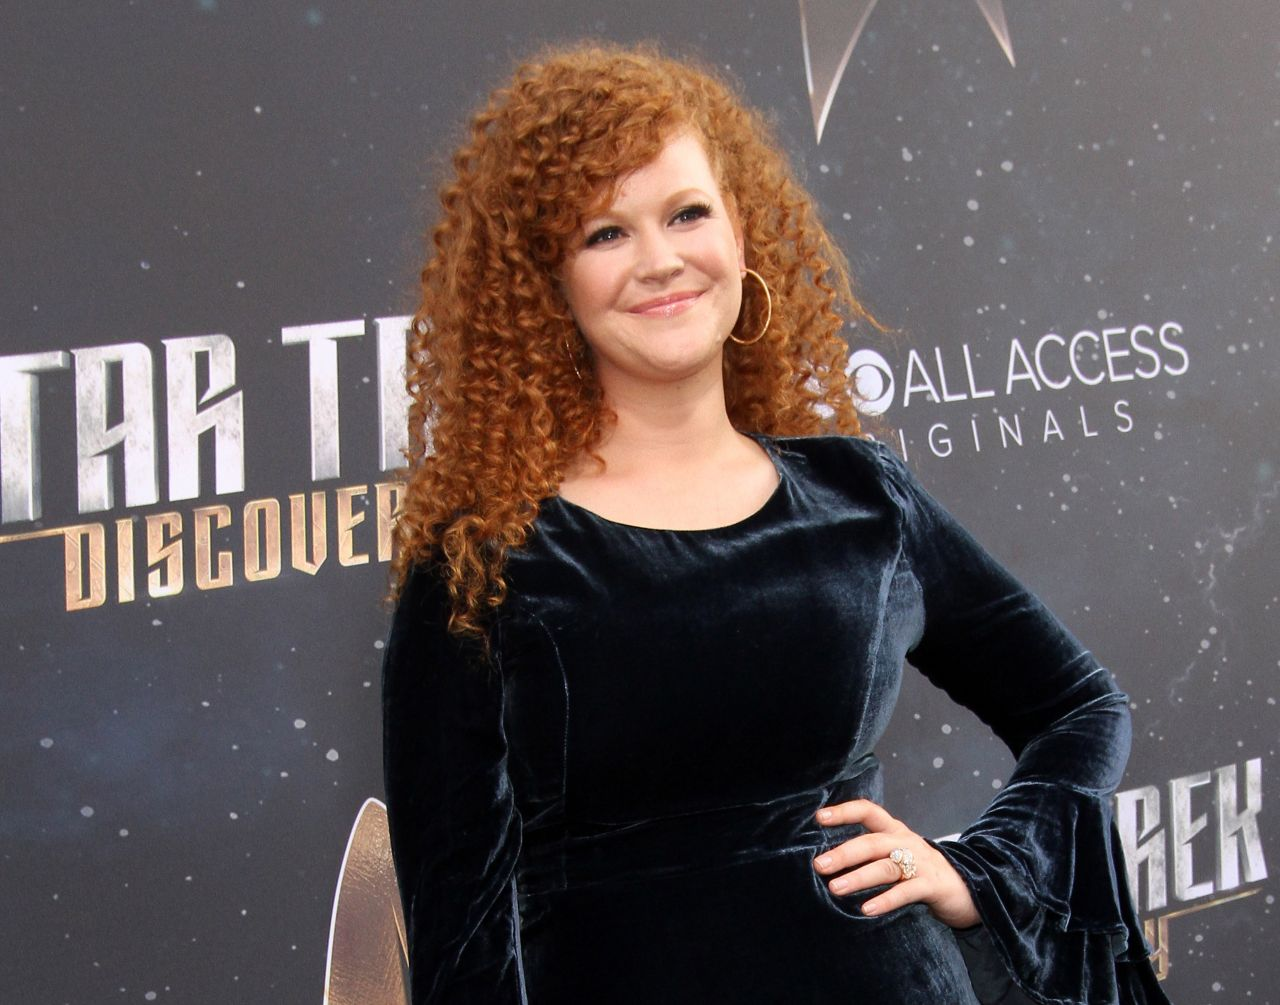 Star Trek: Discovery Mary Wiseman